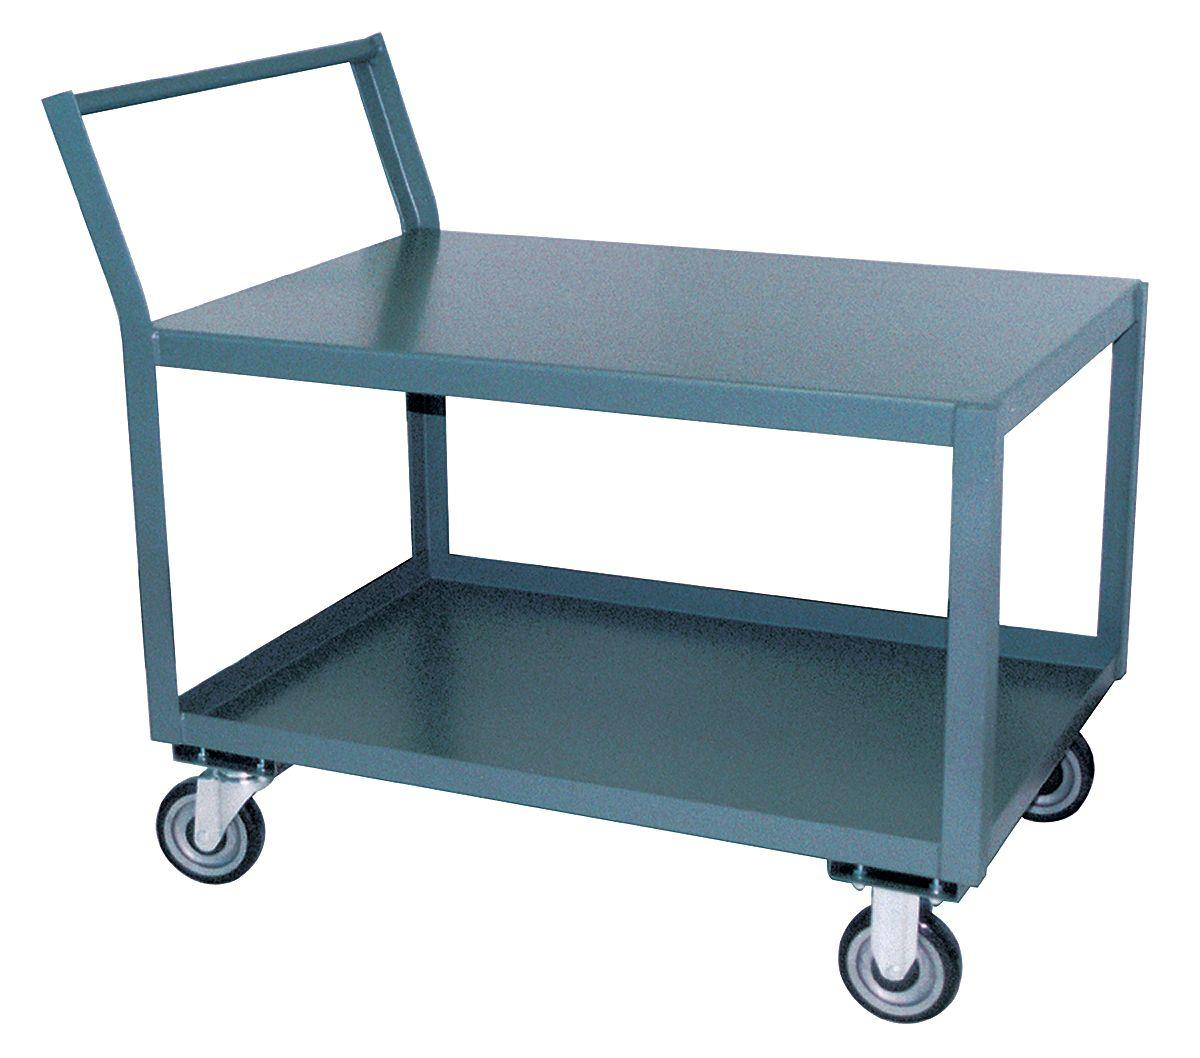 "Jamco SL124 18""x 30"" 2-Shelf Low Deck Cart / Welter P/N 1144-1148 ..."